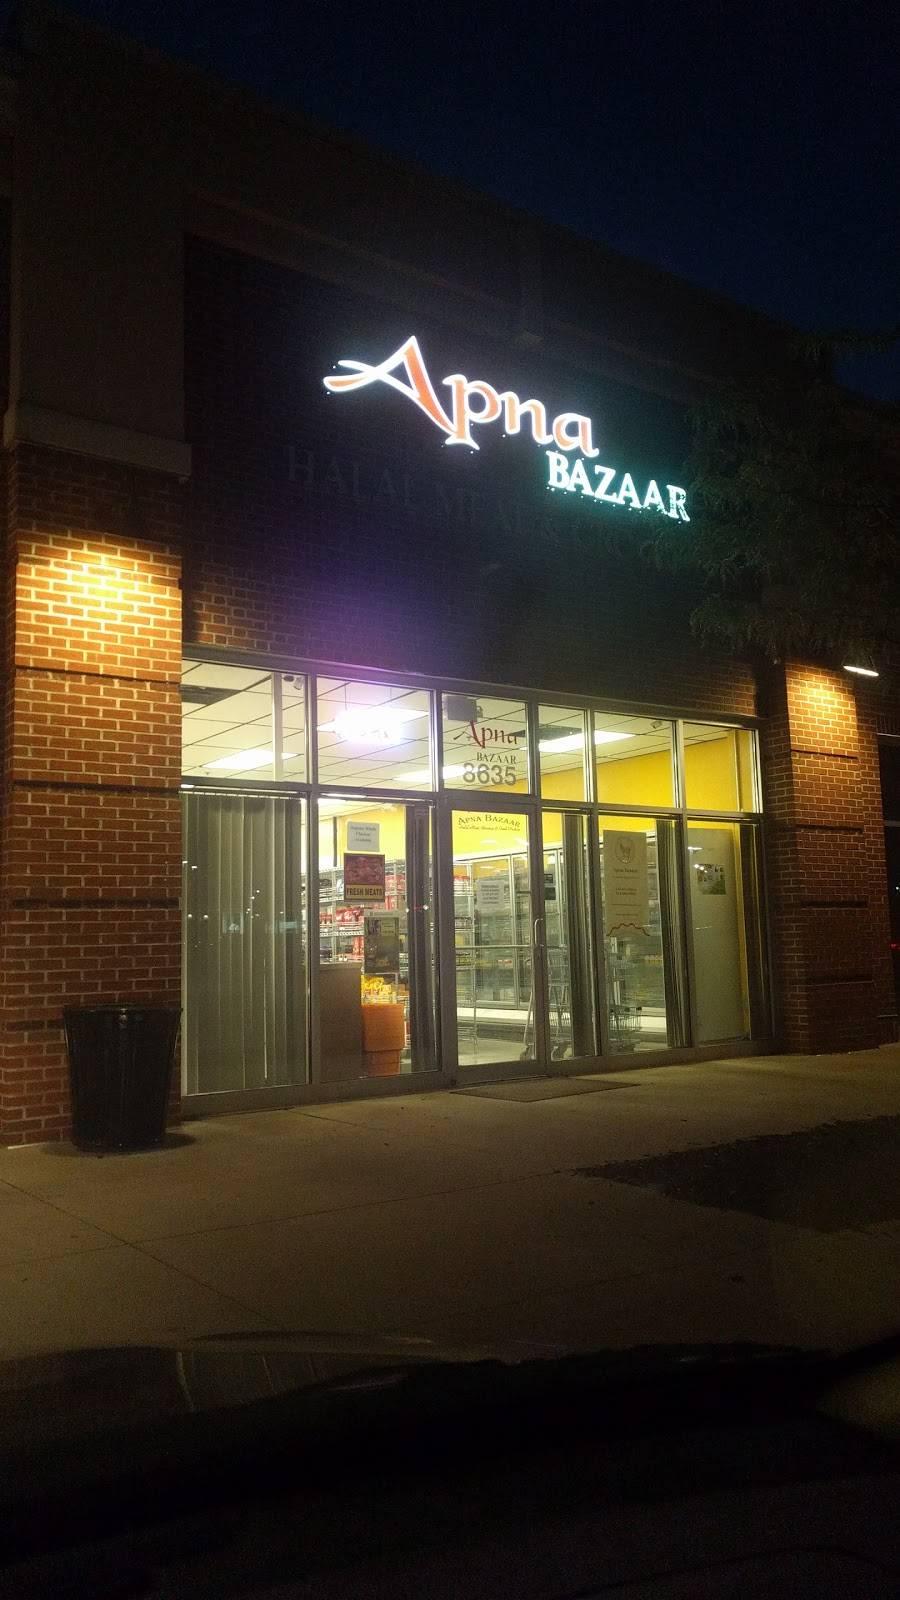 Apna Bazaar Polaris   restaurant   8635 Sancus Blvd, Columbus, OH 43240, USA   6145050667 OR +1 614-505-0667